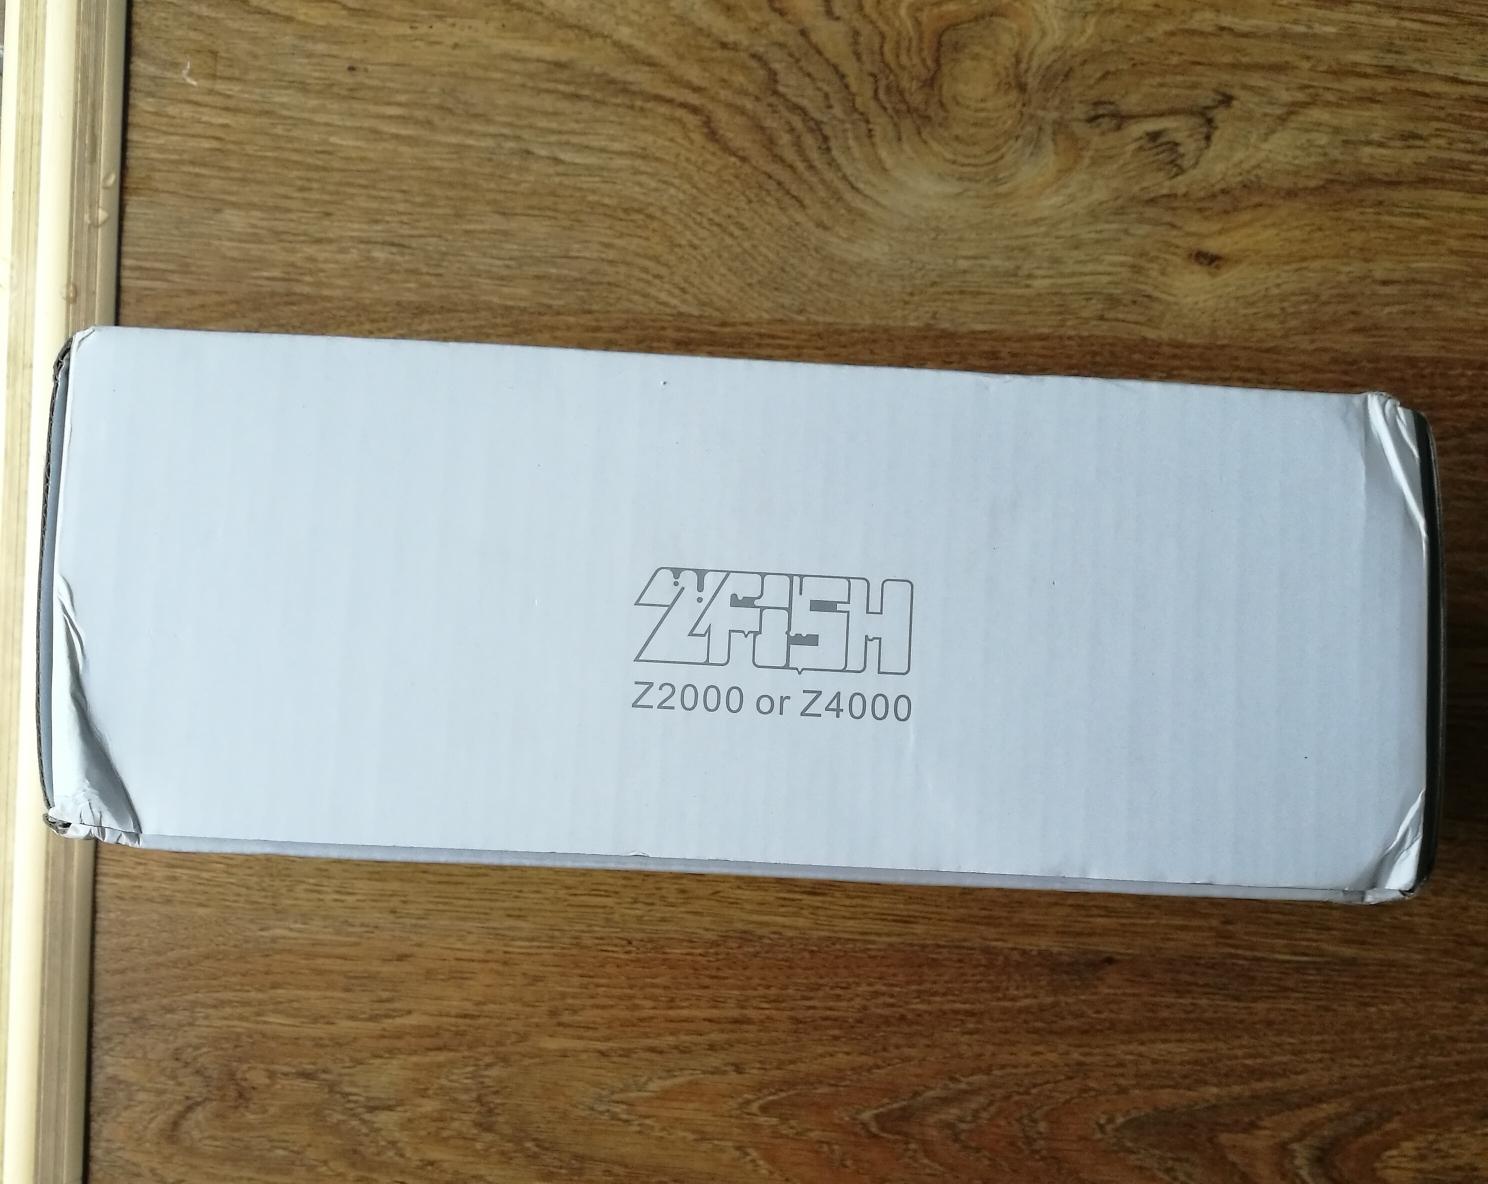 ZFISH变频水泵试用报告 北京龙鱼论坛 北京龙鱼第6张